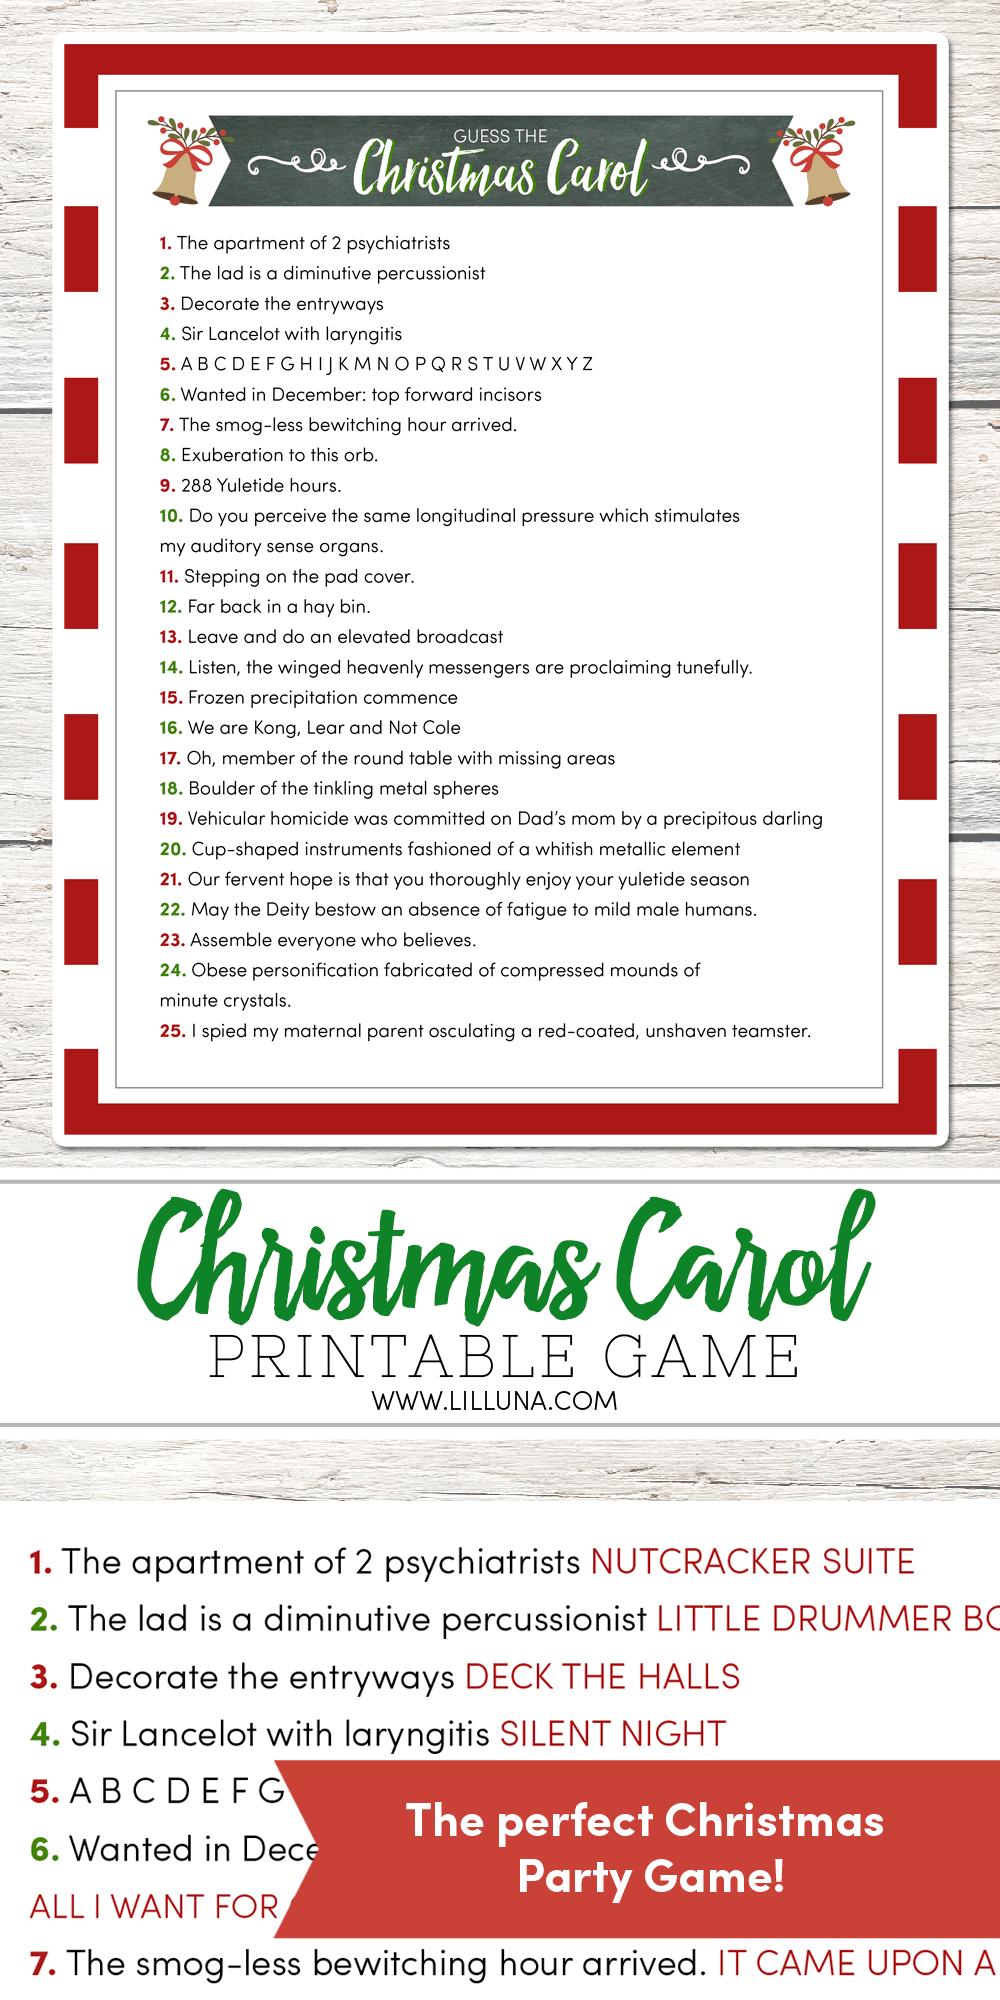 Guess The Christmas Carol Game - Lil' Luna